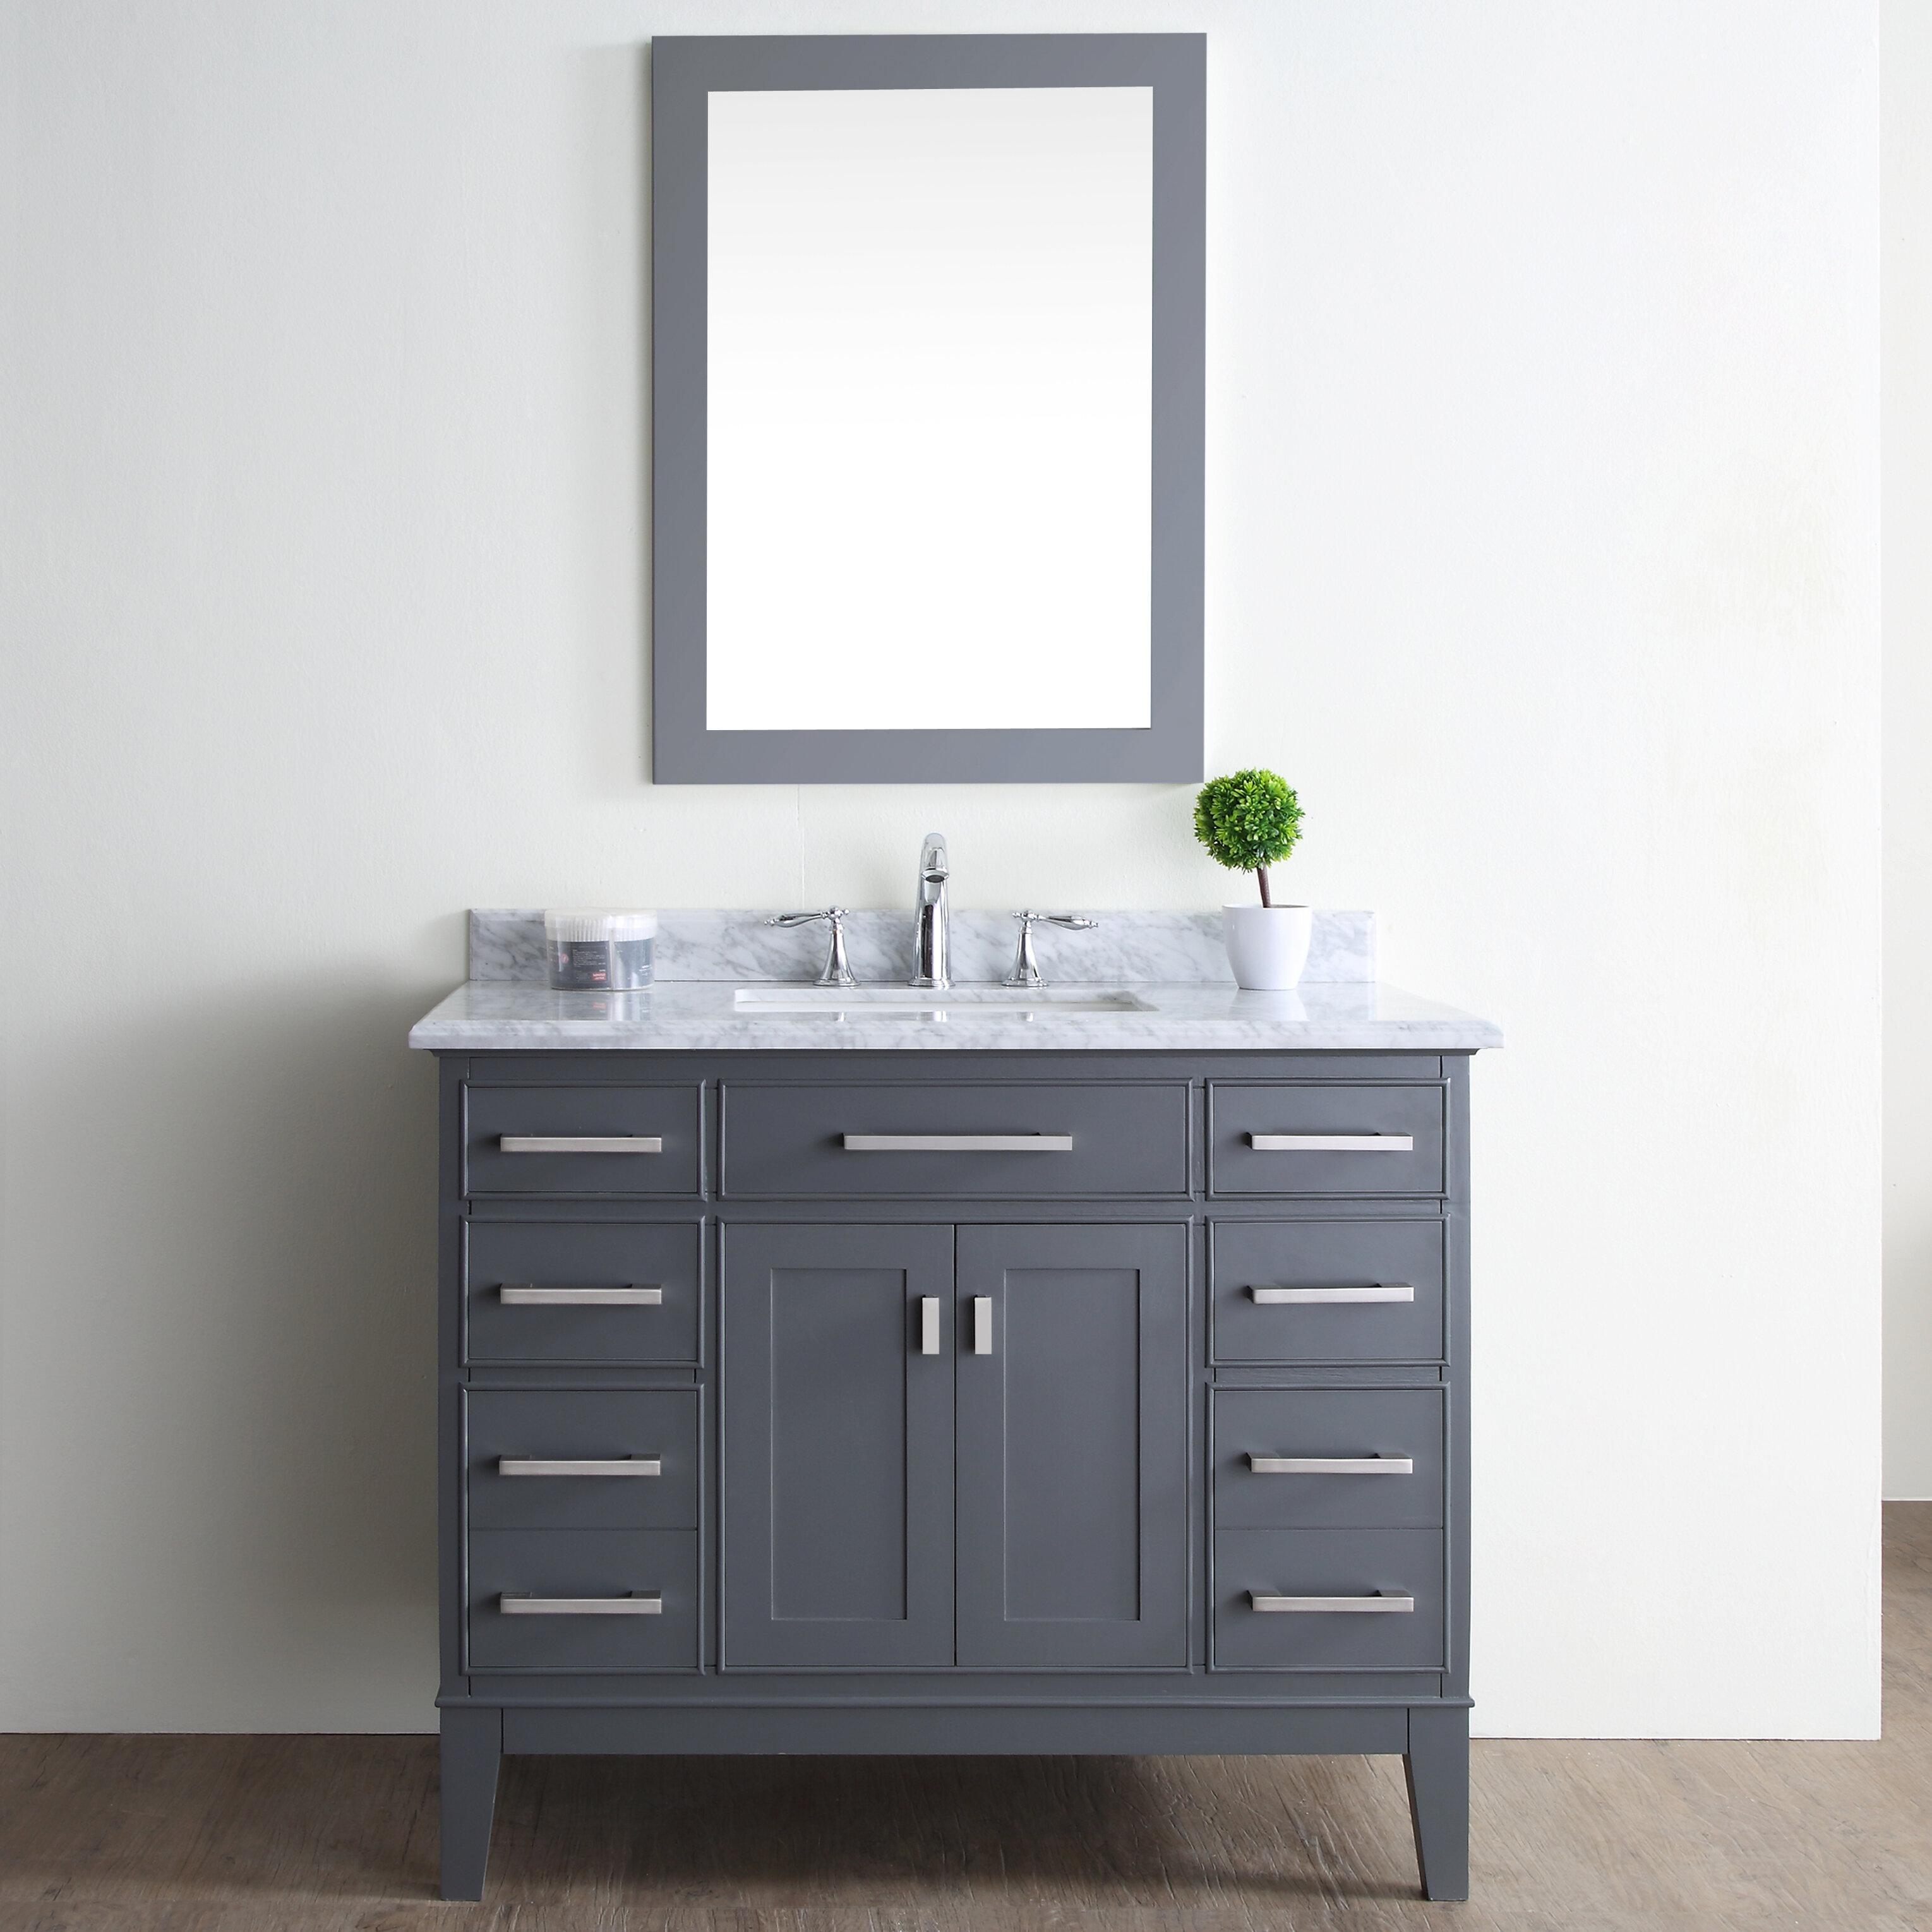 Sets bathroom vanity ari kitchen second - Ari Kitchen Bath Danny 42 Single Bathroom Vanity Set Reviews Wayfair